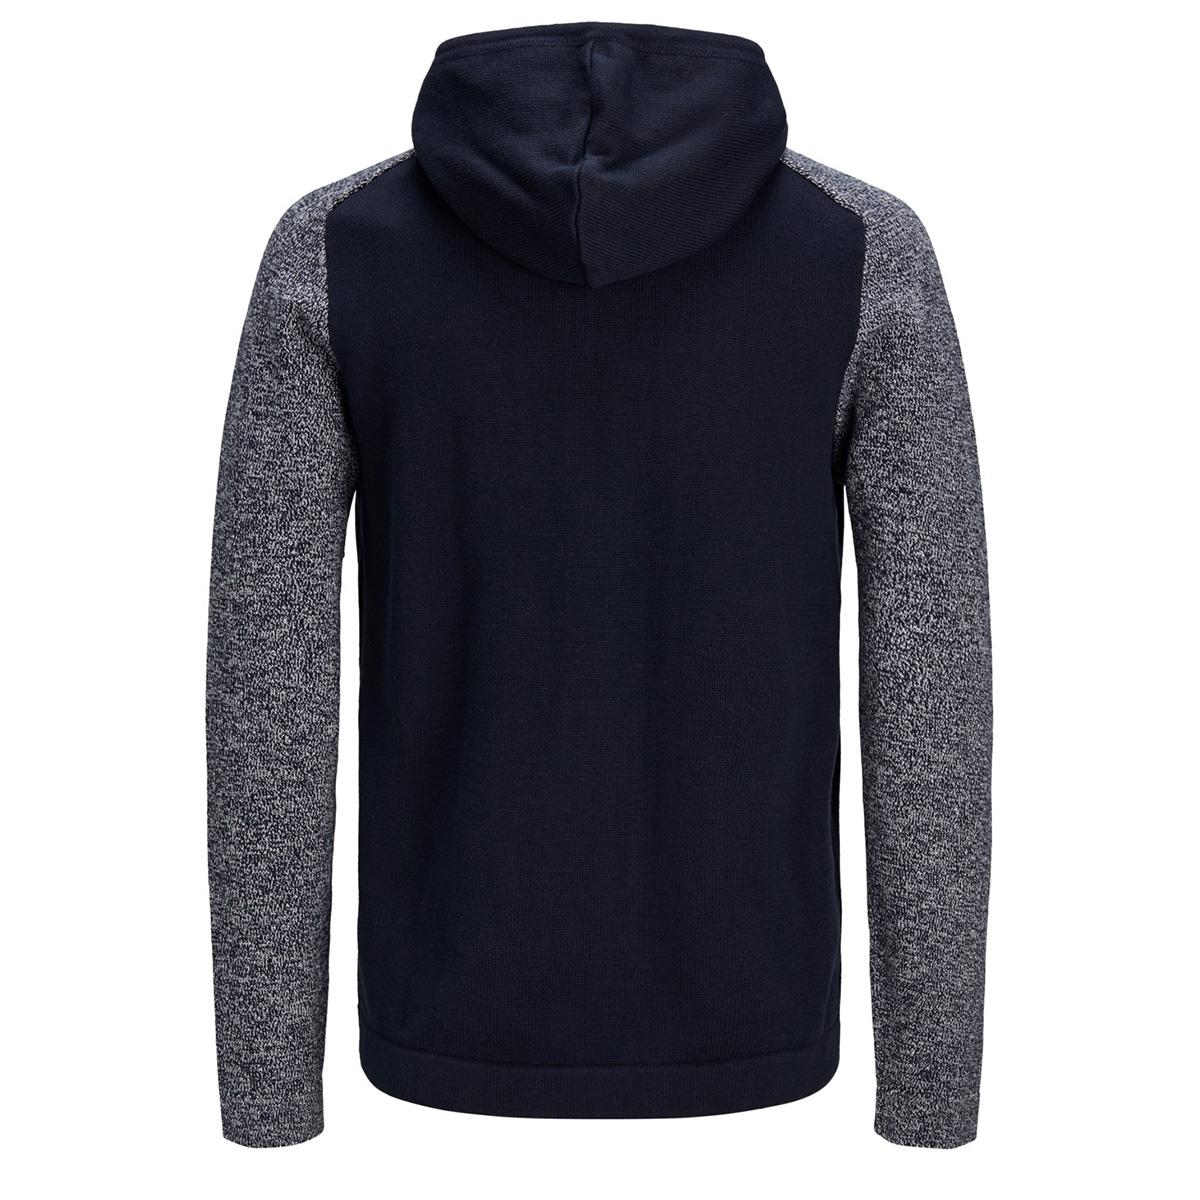 jcomix knit hood cardigan 12157836 jack & jones vest sky captain/solid body